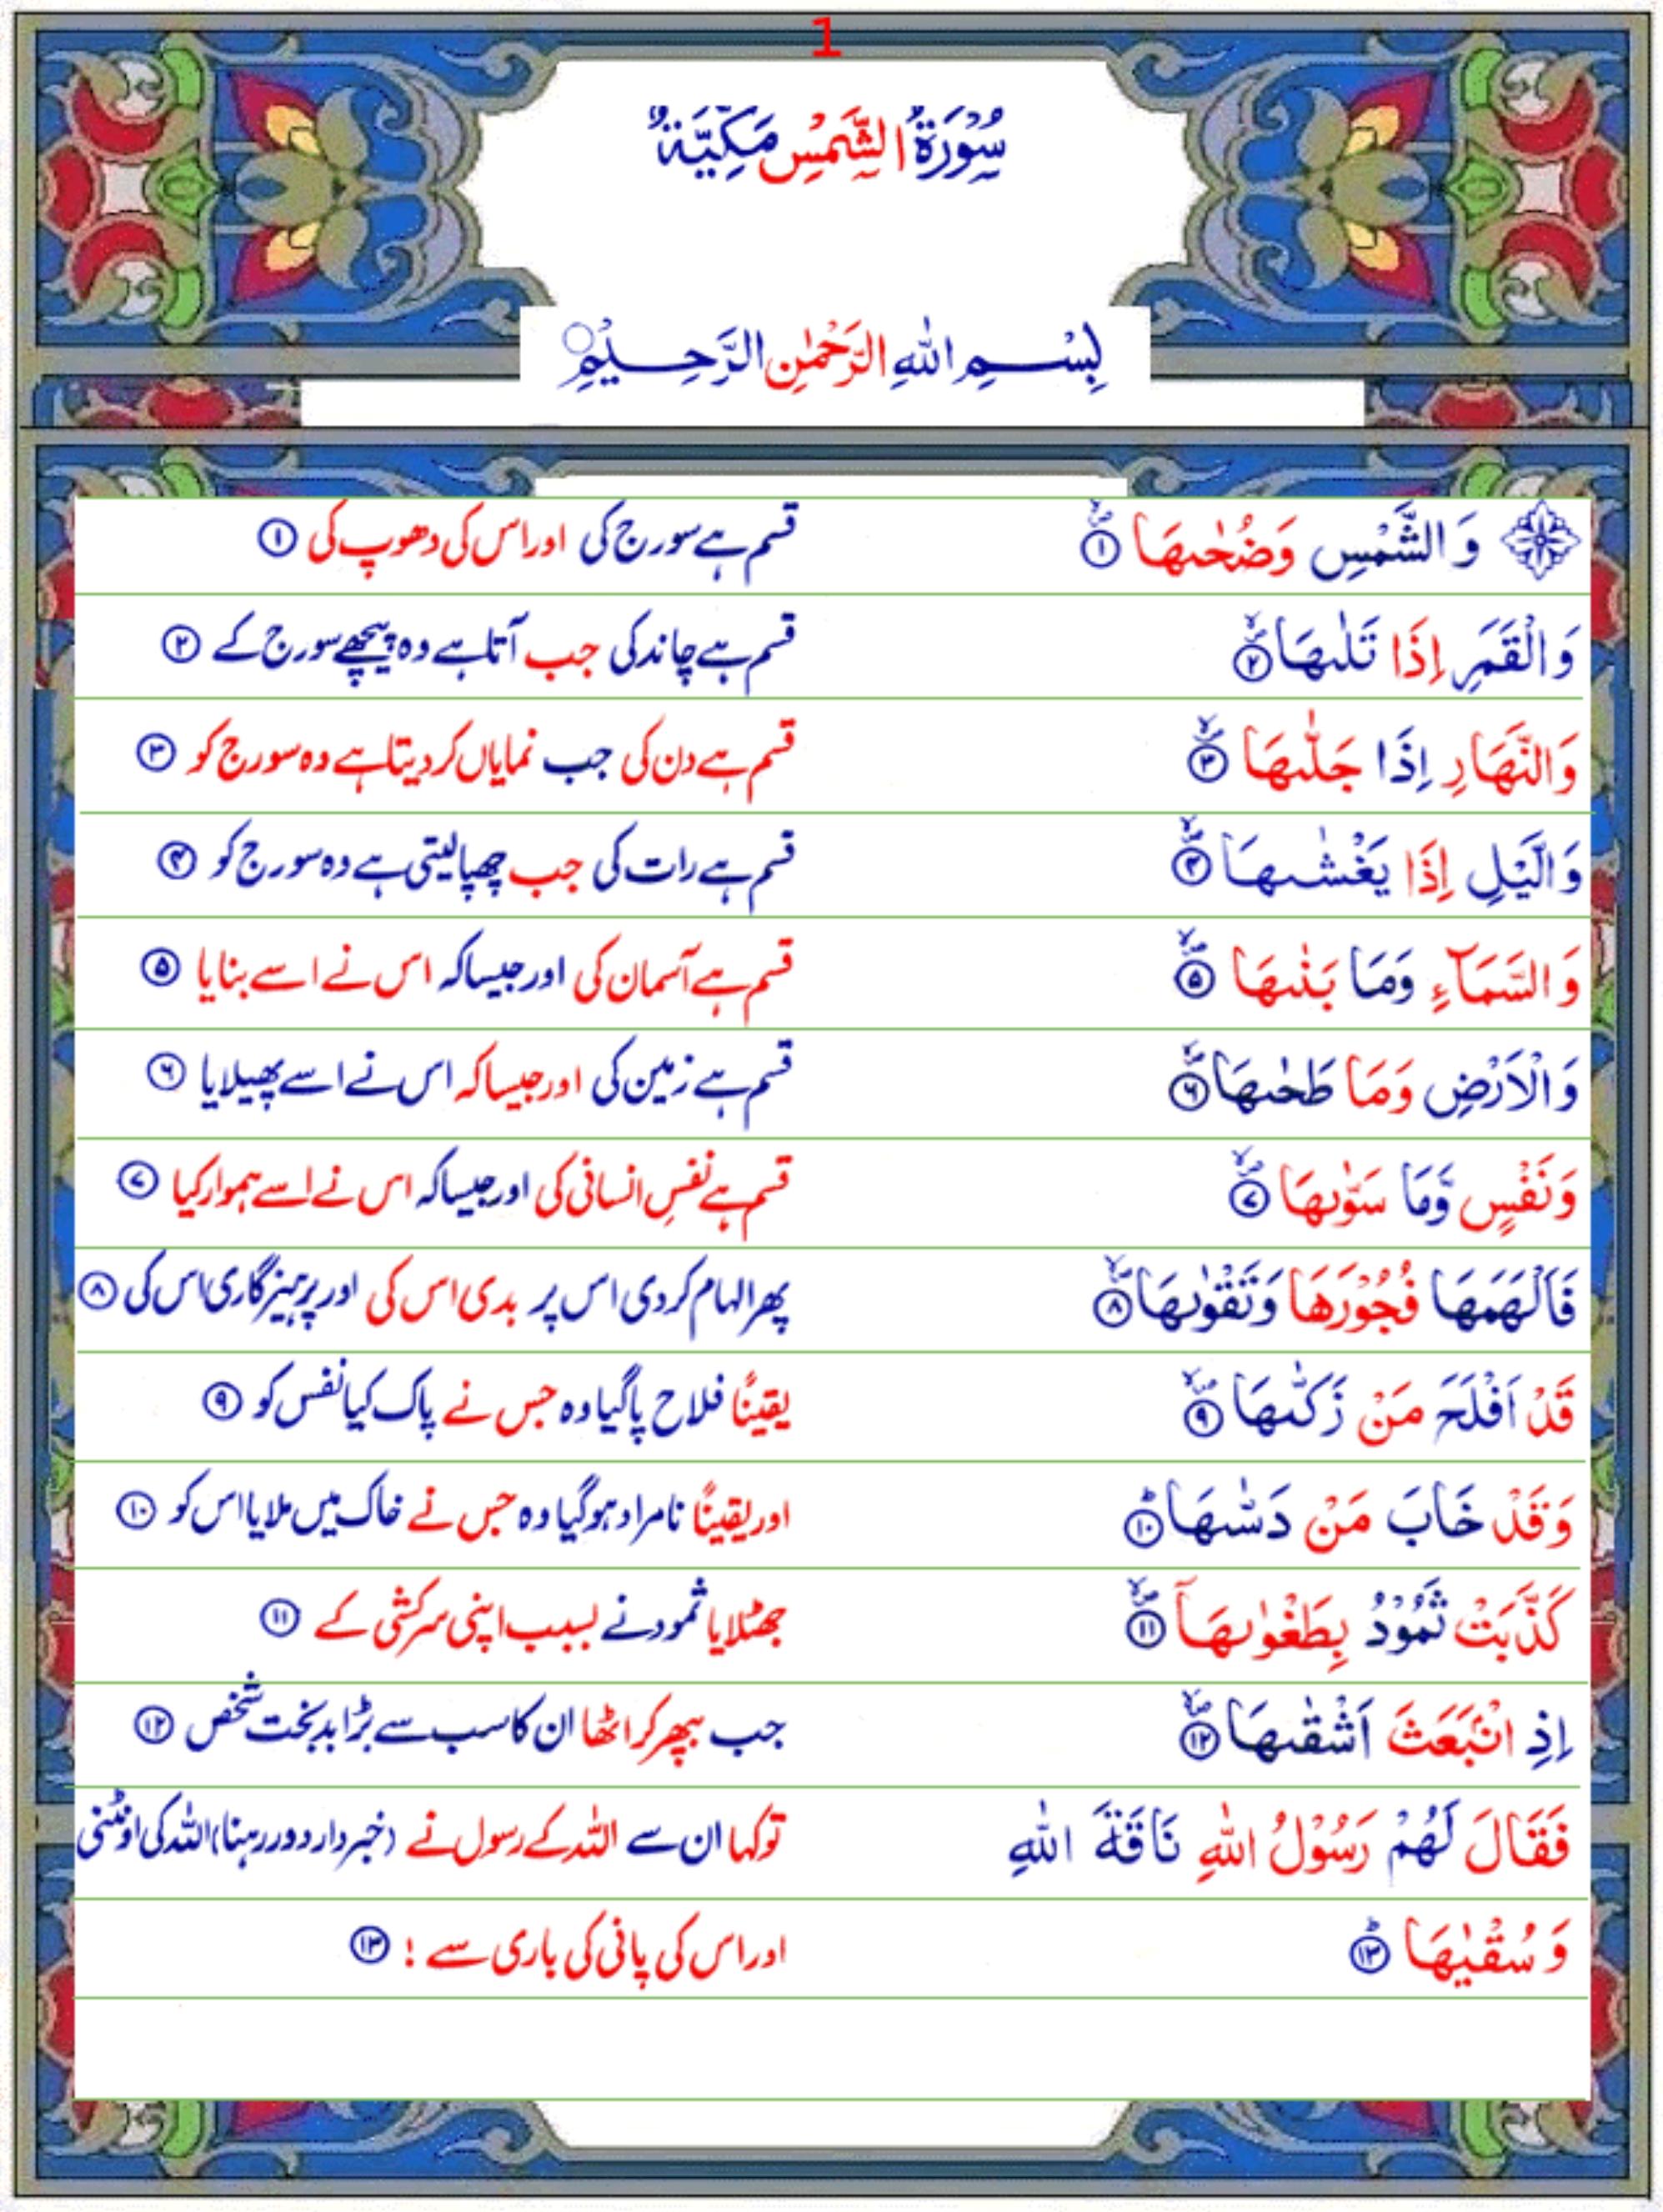 Surah Ash Shams Urdu1 Quran O Sunnat